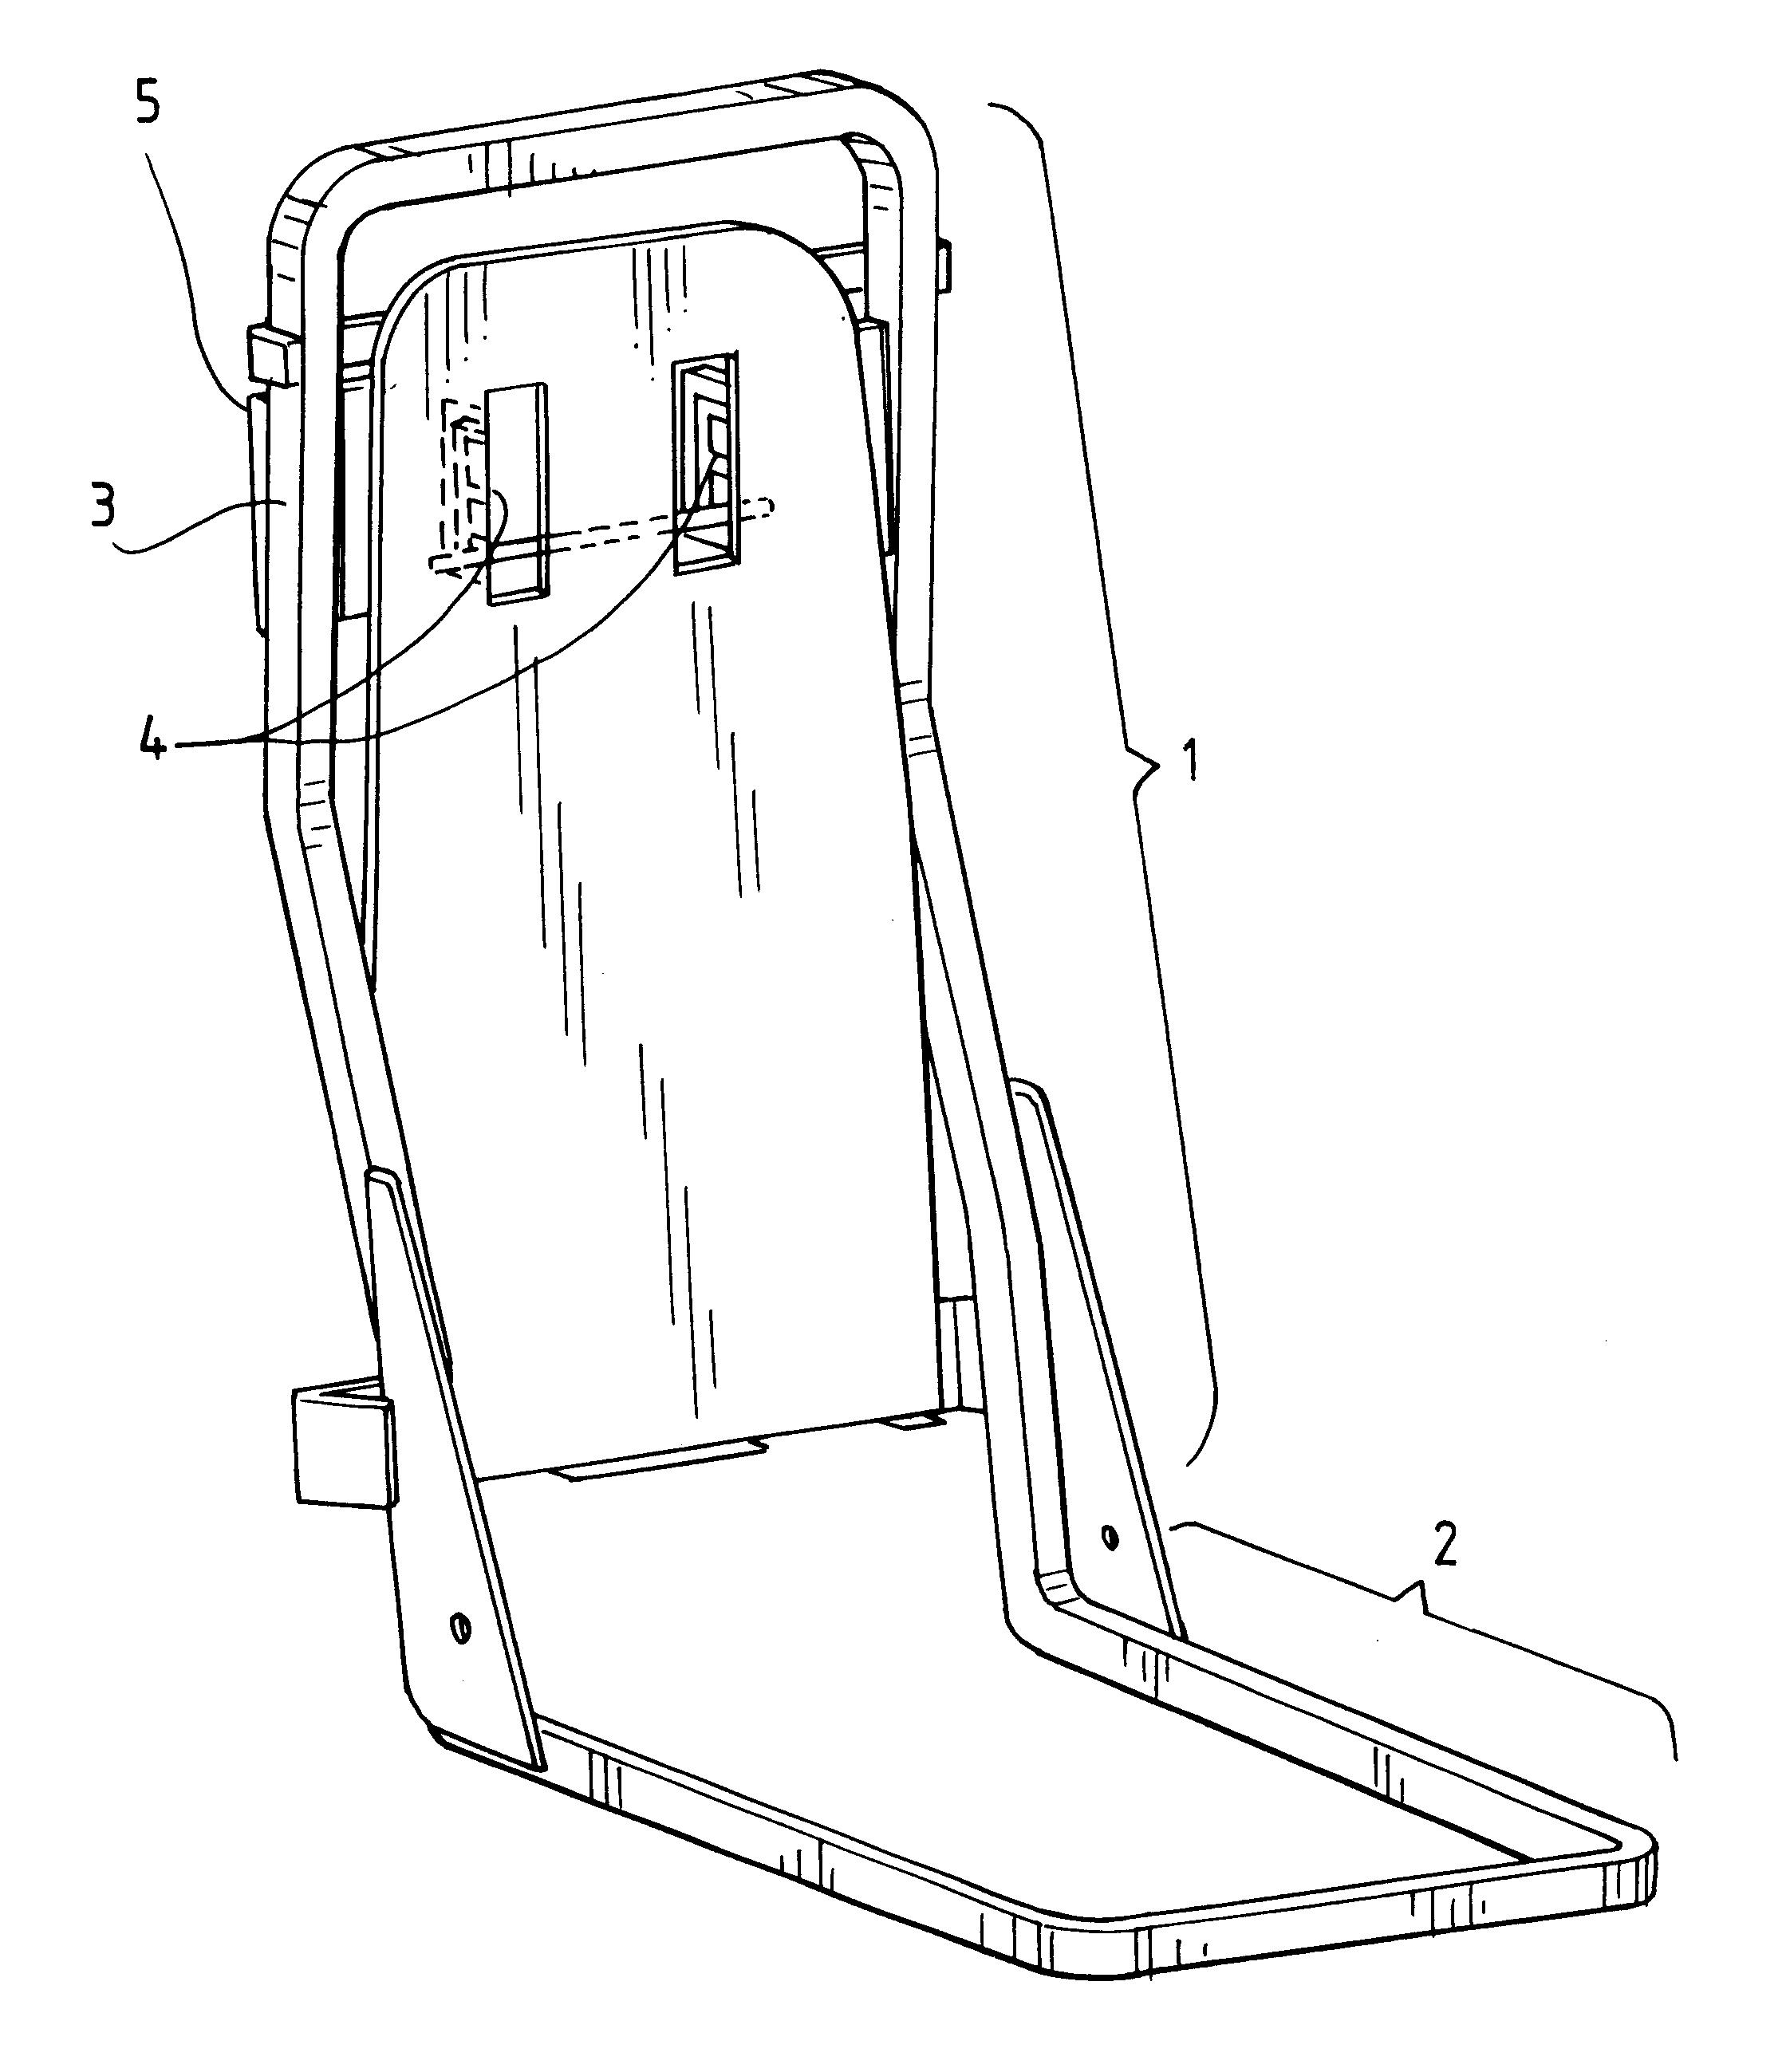 U.S. Patent #6398302